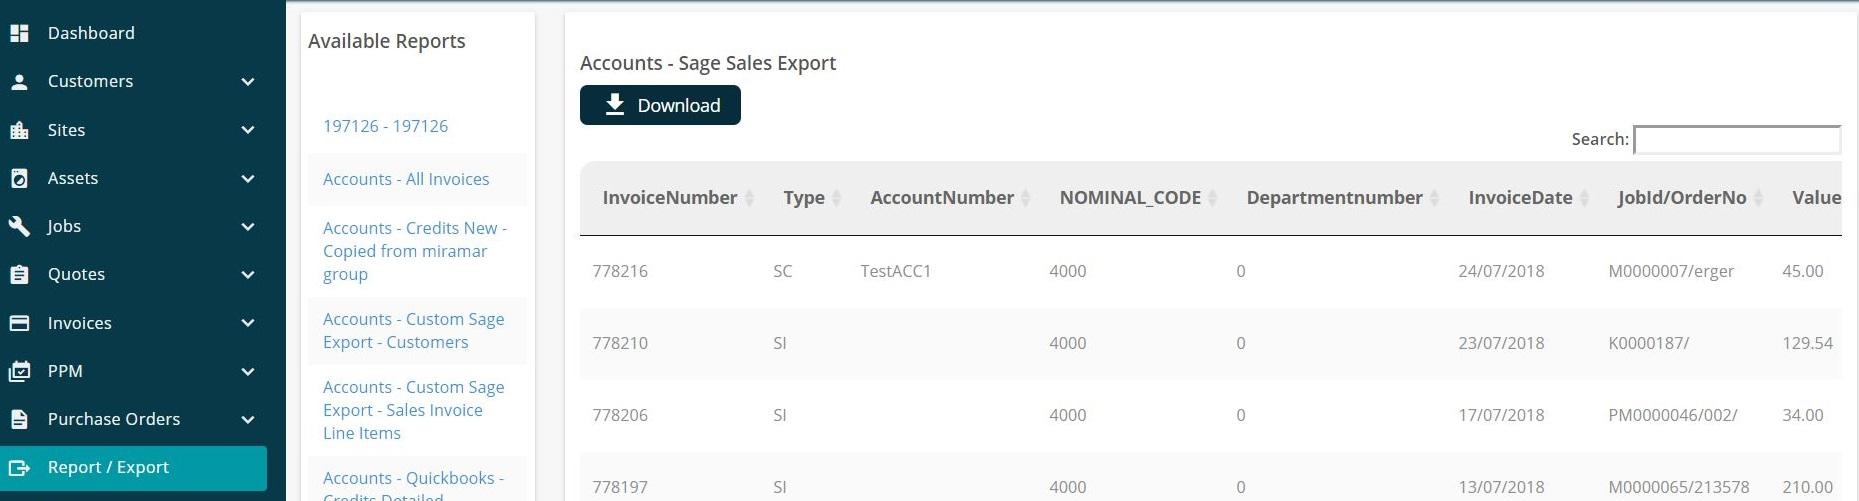 Joblogic Web - 'Report/Export' screen